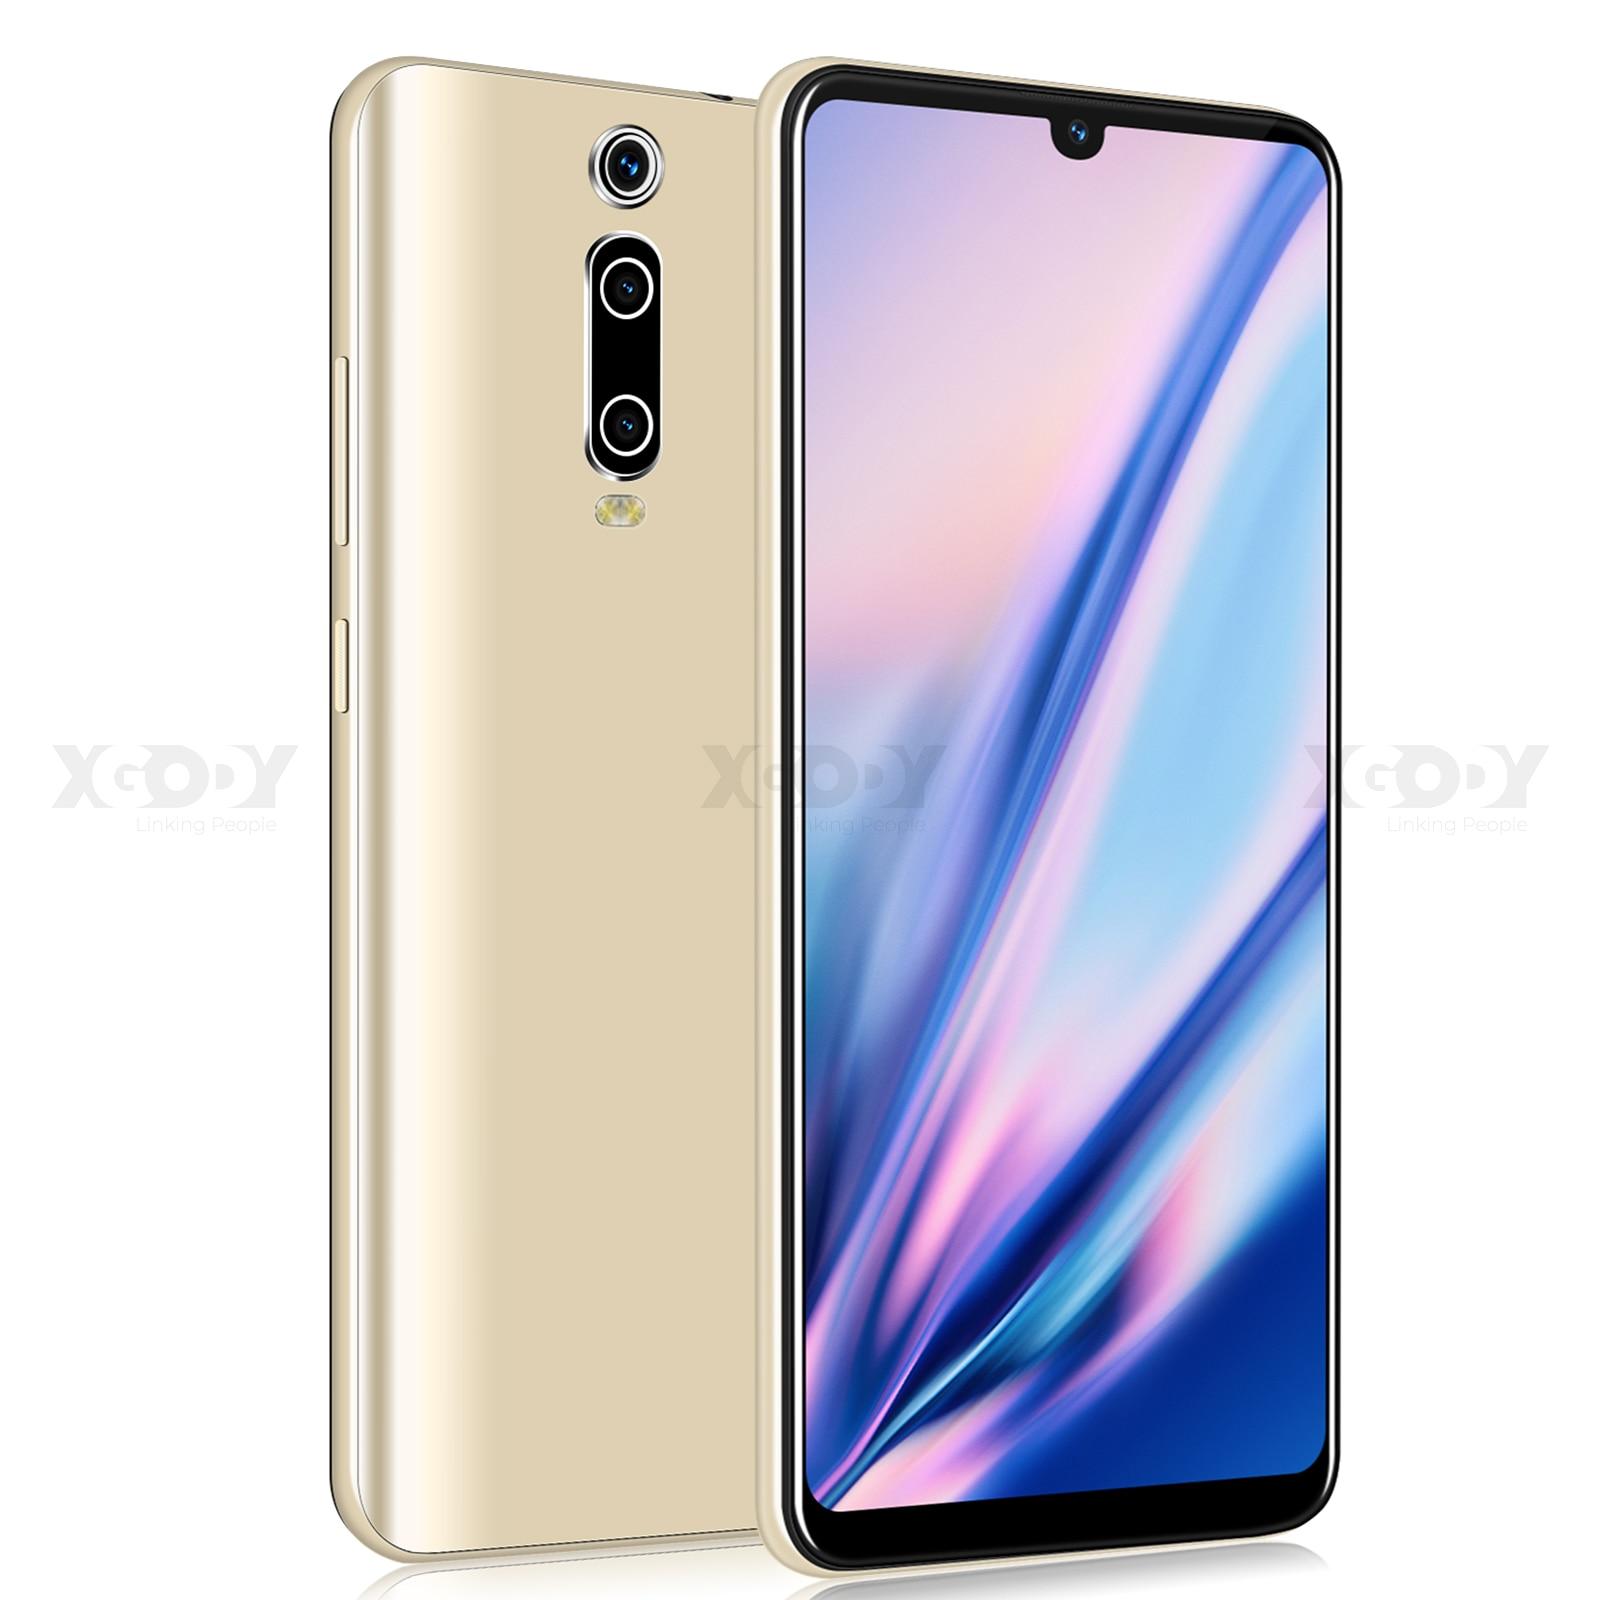 XGODY 3G Mobile Phone 9T 1GB 4GB 6 26 QHD Screen MTK6580 Quad Core Android 9 XGODY 3G Mobile Phone 9T 1GB 4GB 6.26'' QHD Screen MTK6580 Quad Core Android 9.0 Waterdrop Full Screen 2800mAh Smartphone